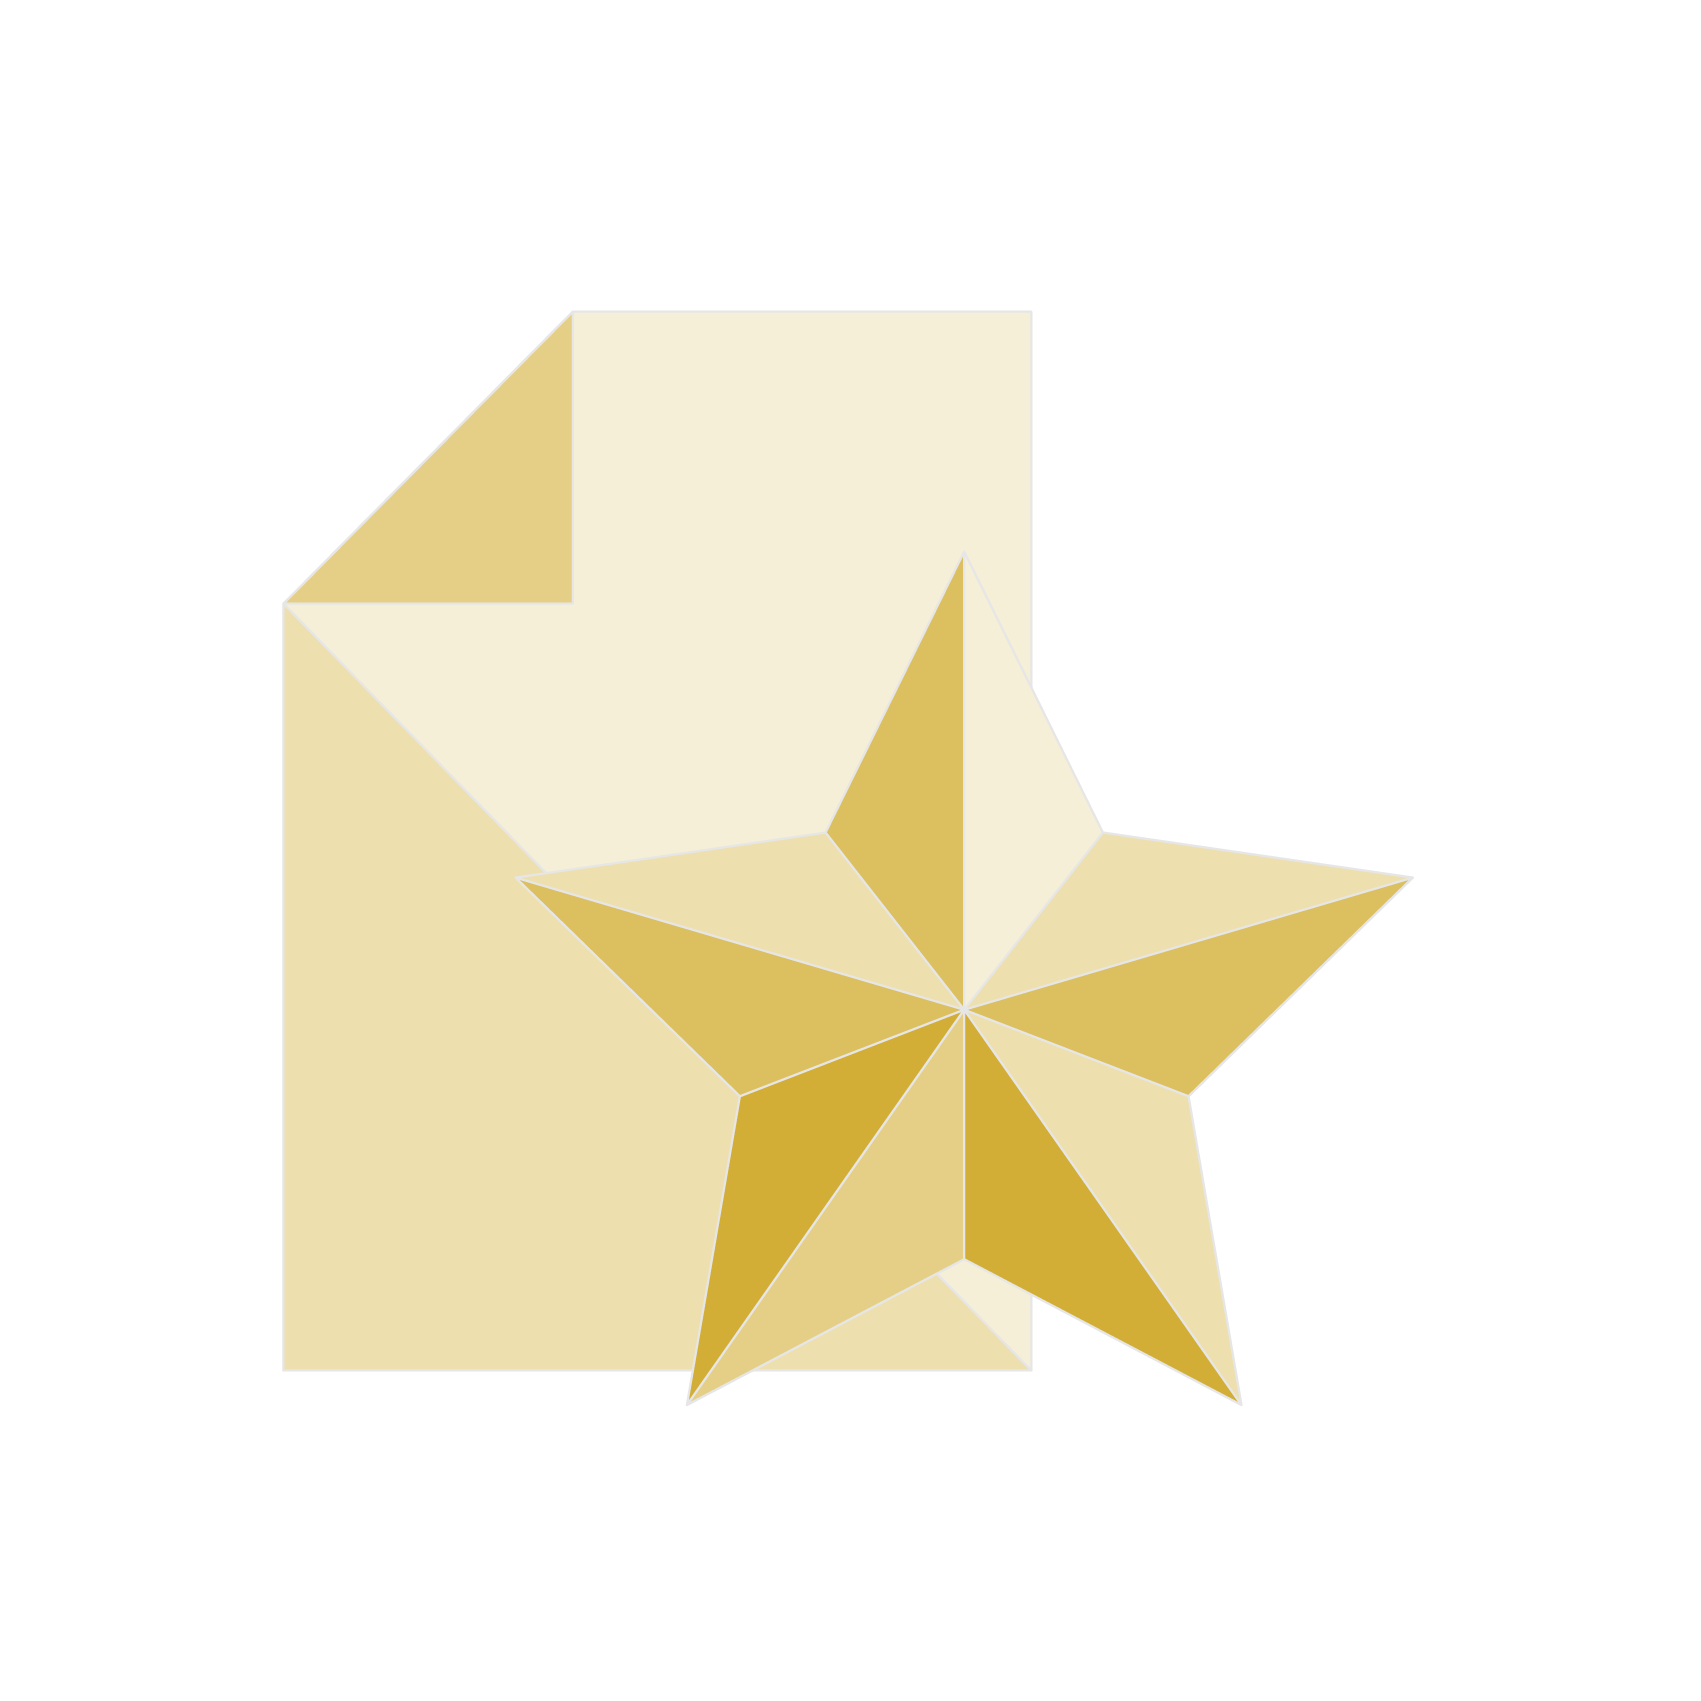 grandega_illustration_allgemein_Gratifikationsbericht_gold_rgb